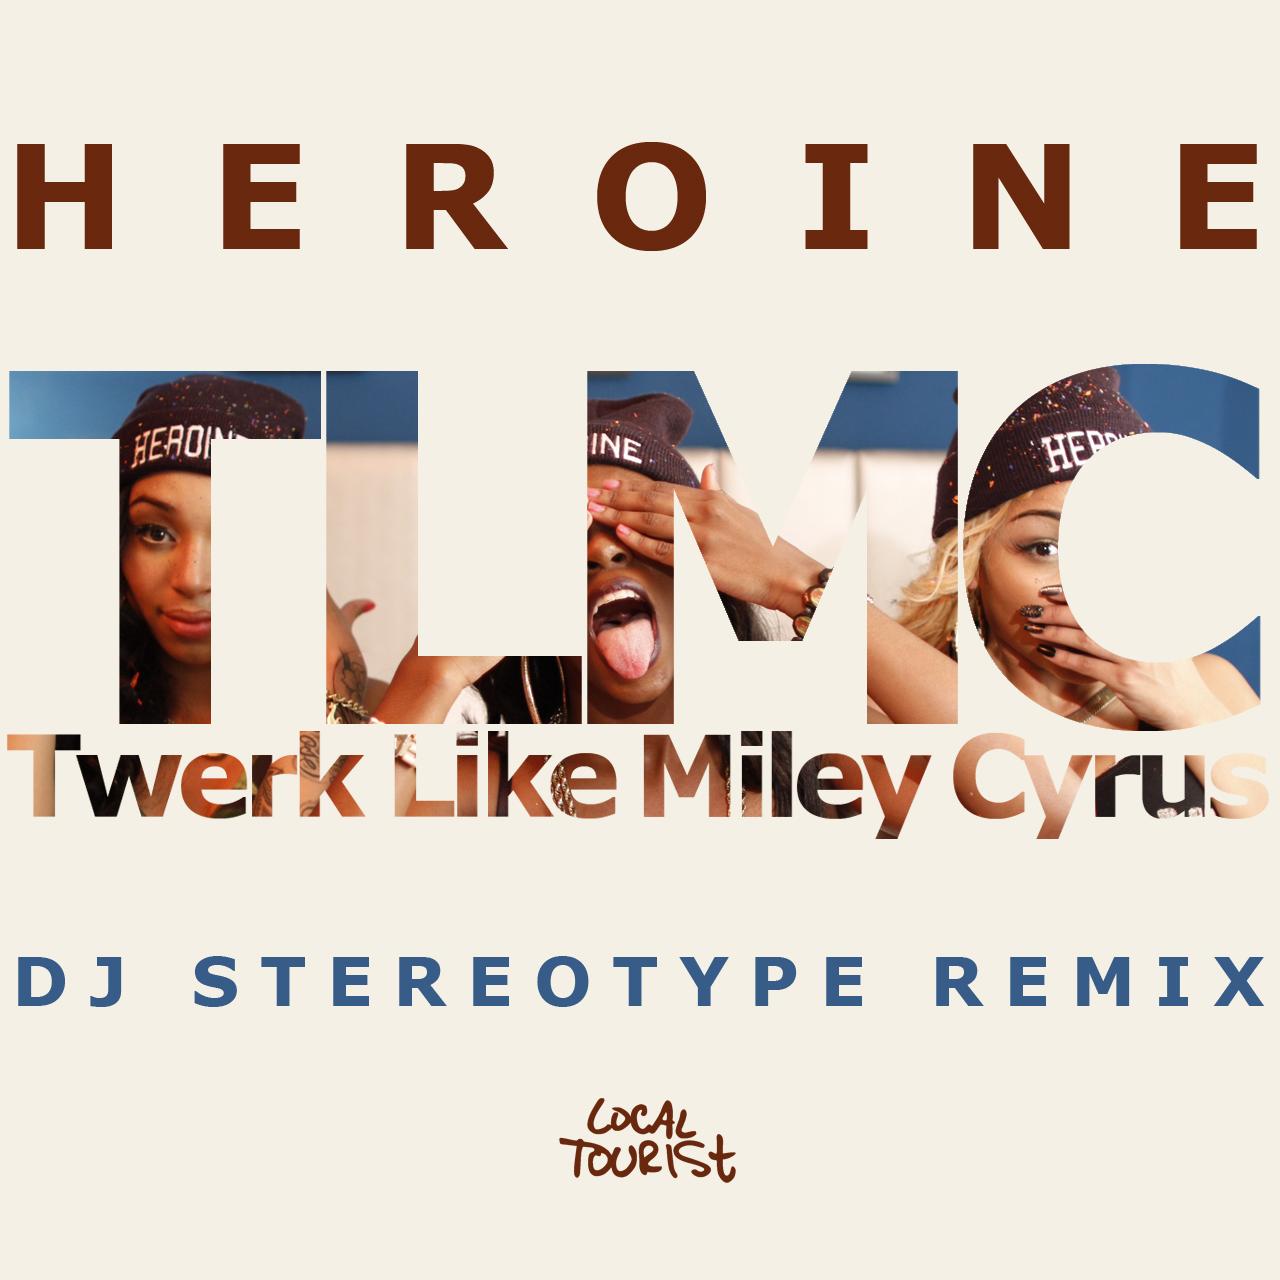 dj-stereotype-tlmc-remix-heroine-grungecake-thumbnail